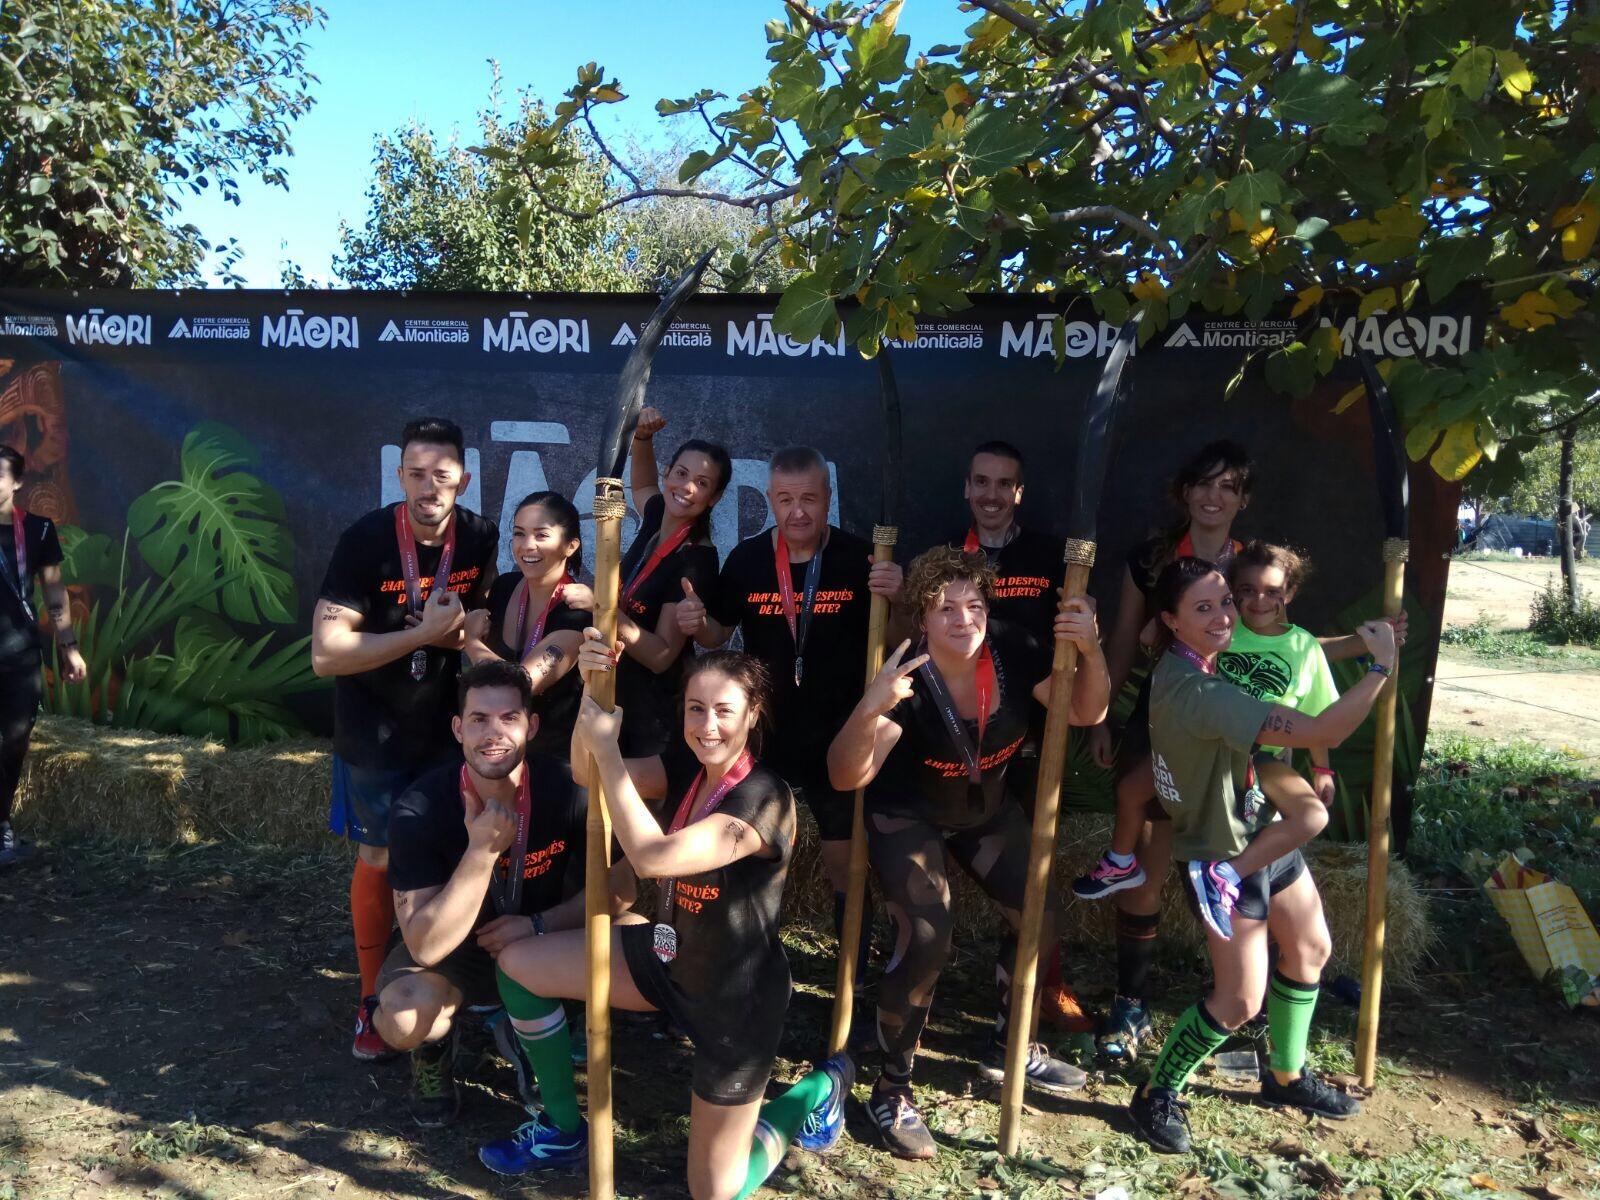 crossfit sjd maori race 2017